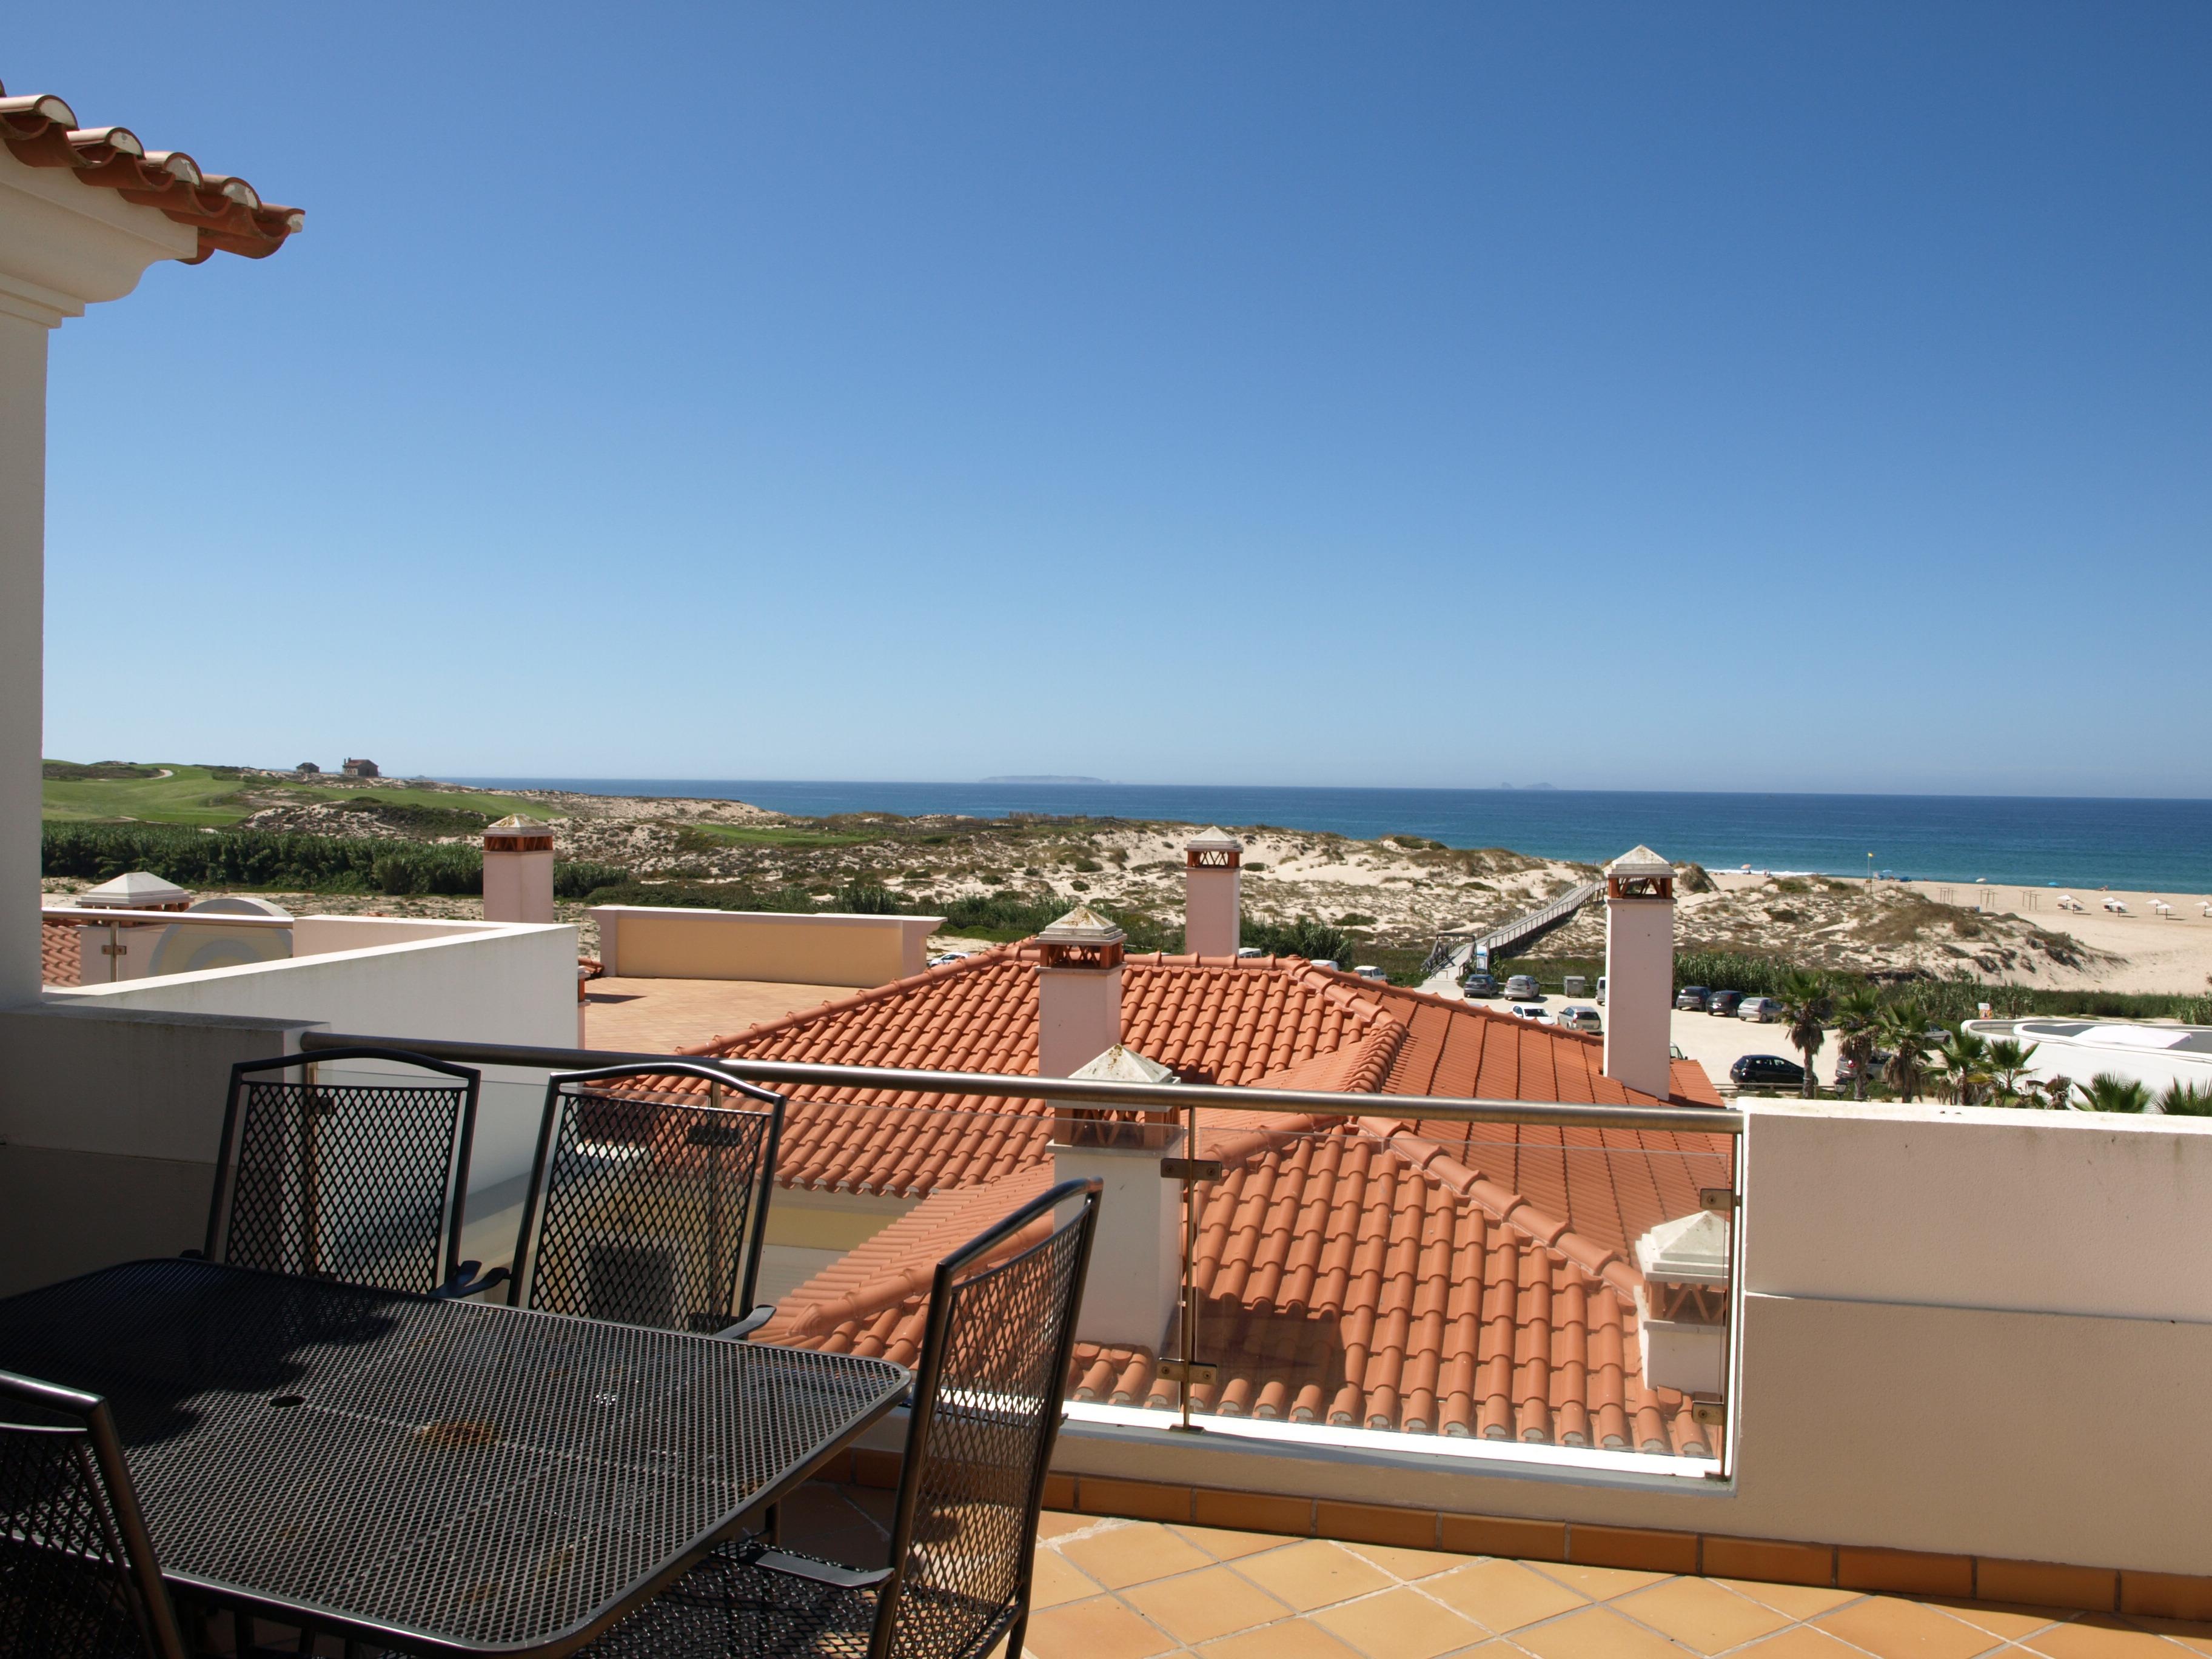 Praia Del Rey Property For Sale